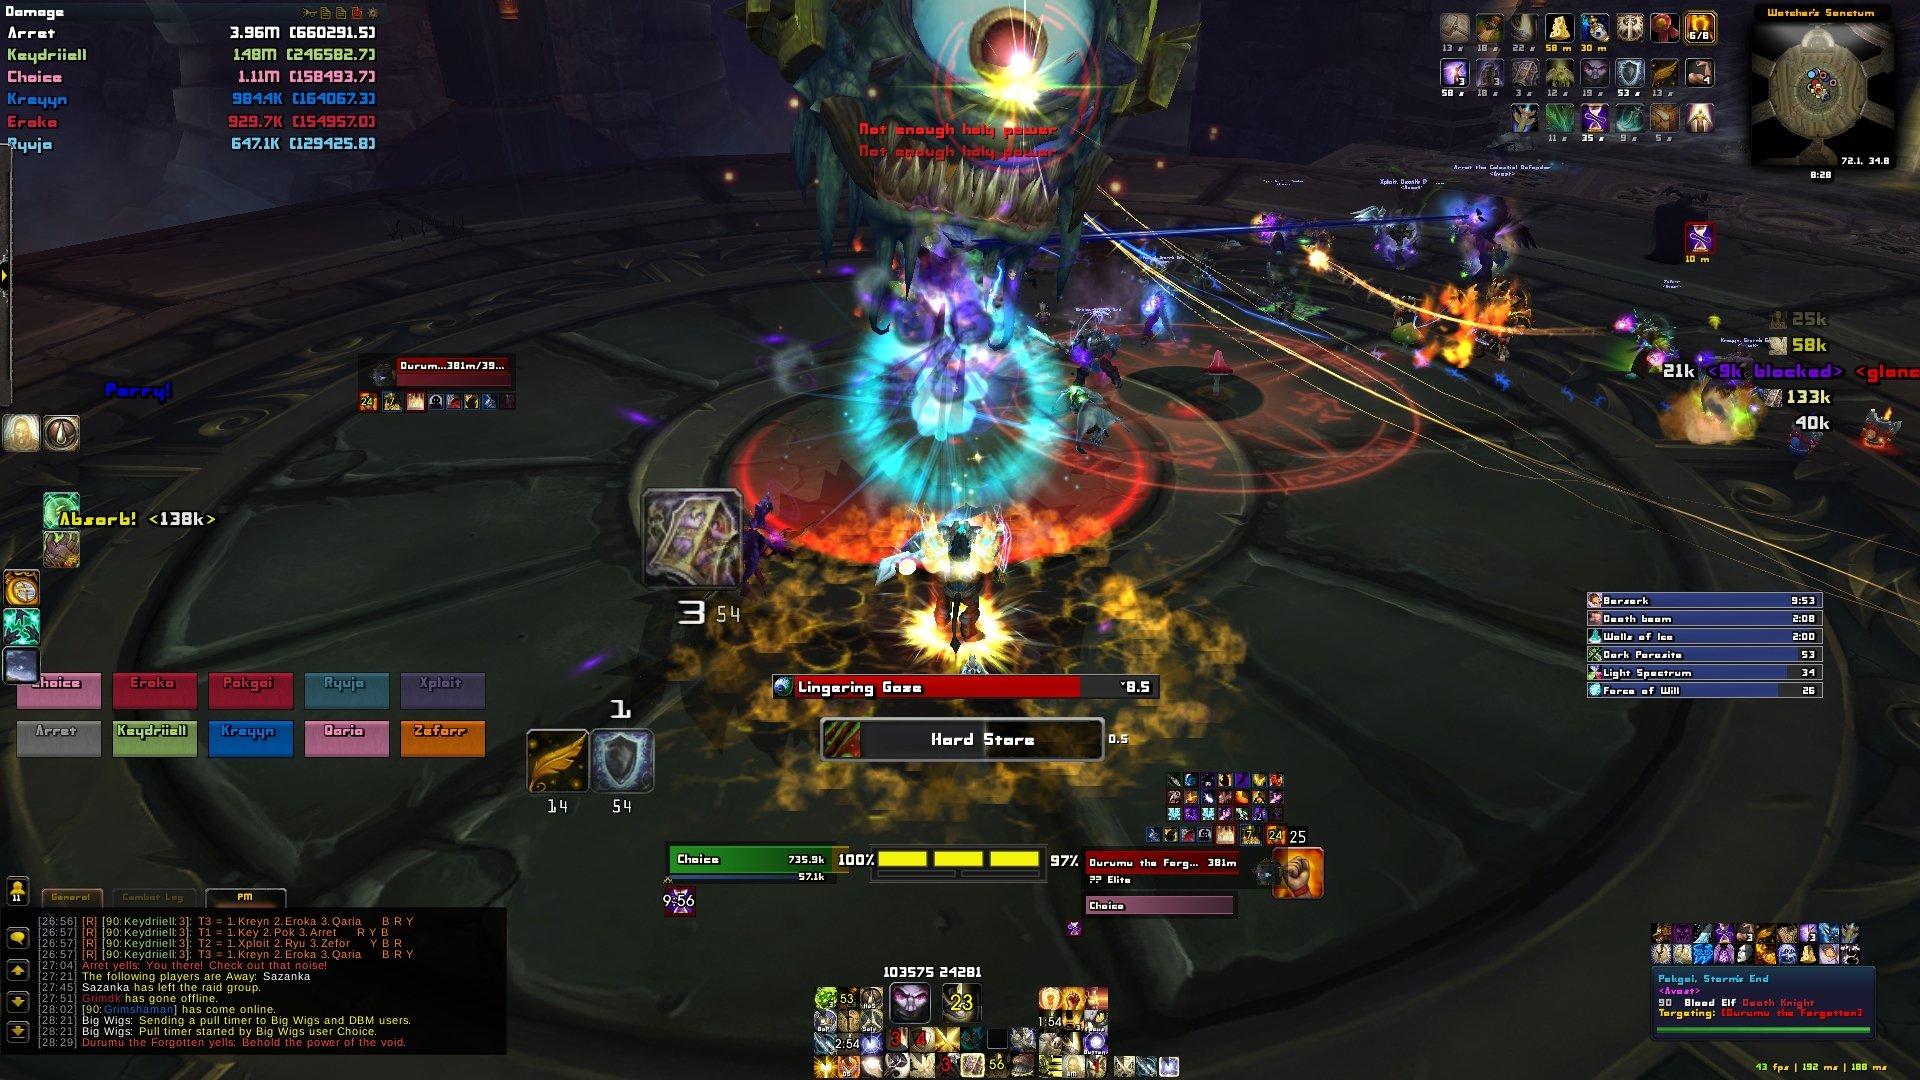 ChoiceUI - Protection Paladin UI : Tank Compilations : World of Warcraft AddOns